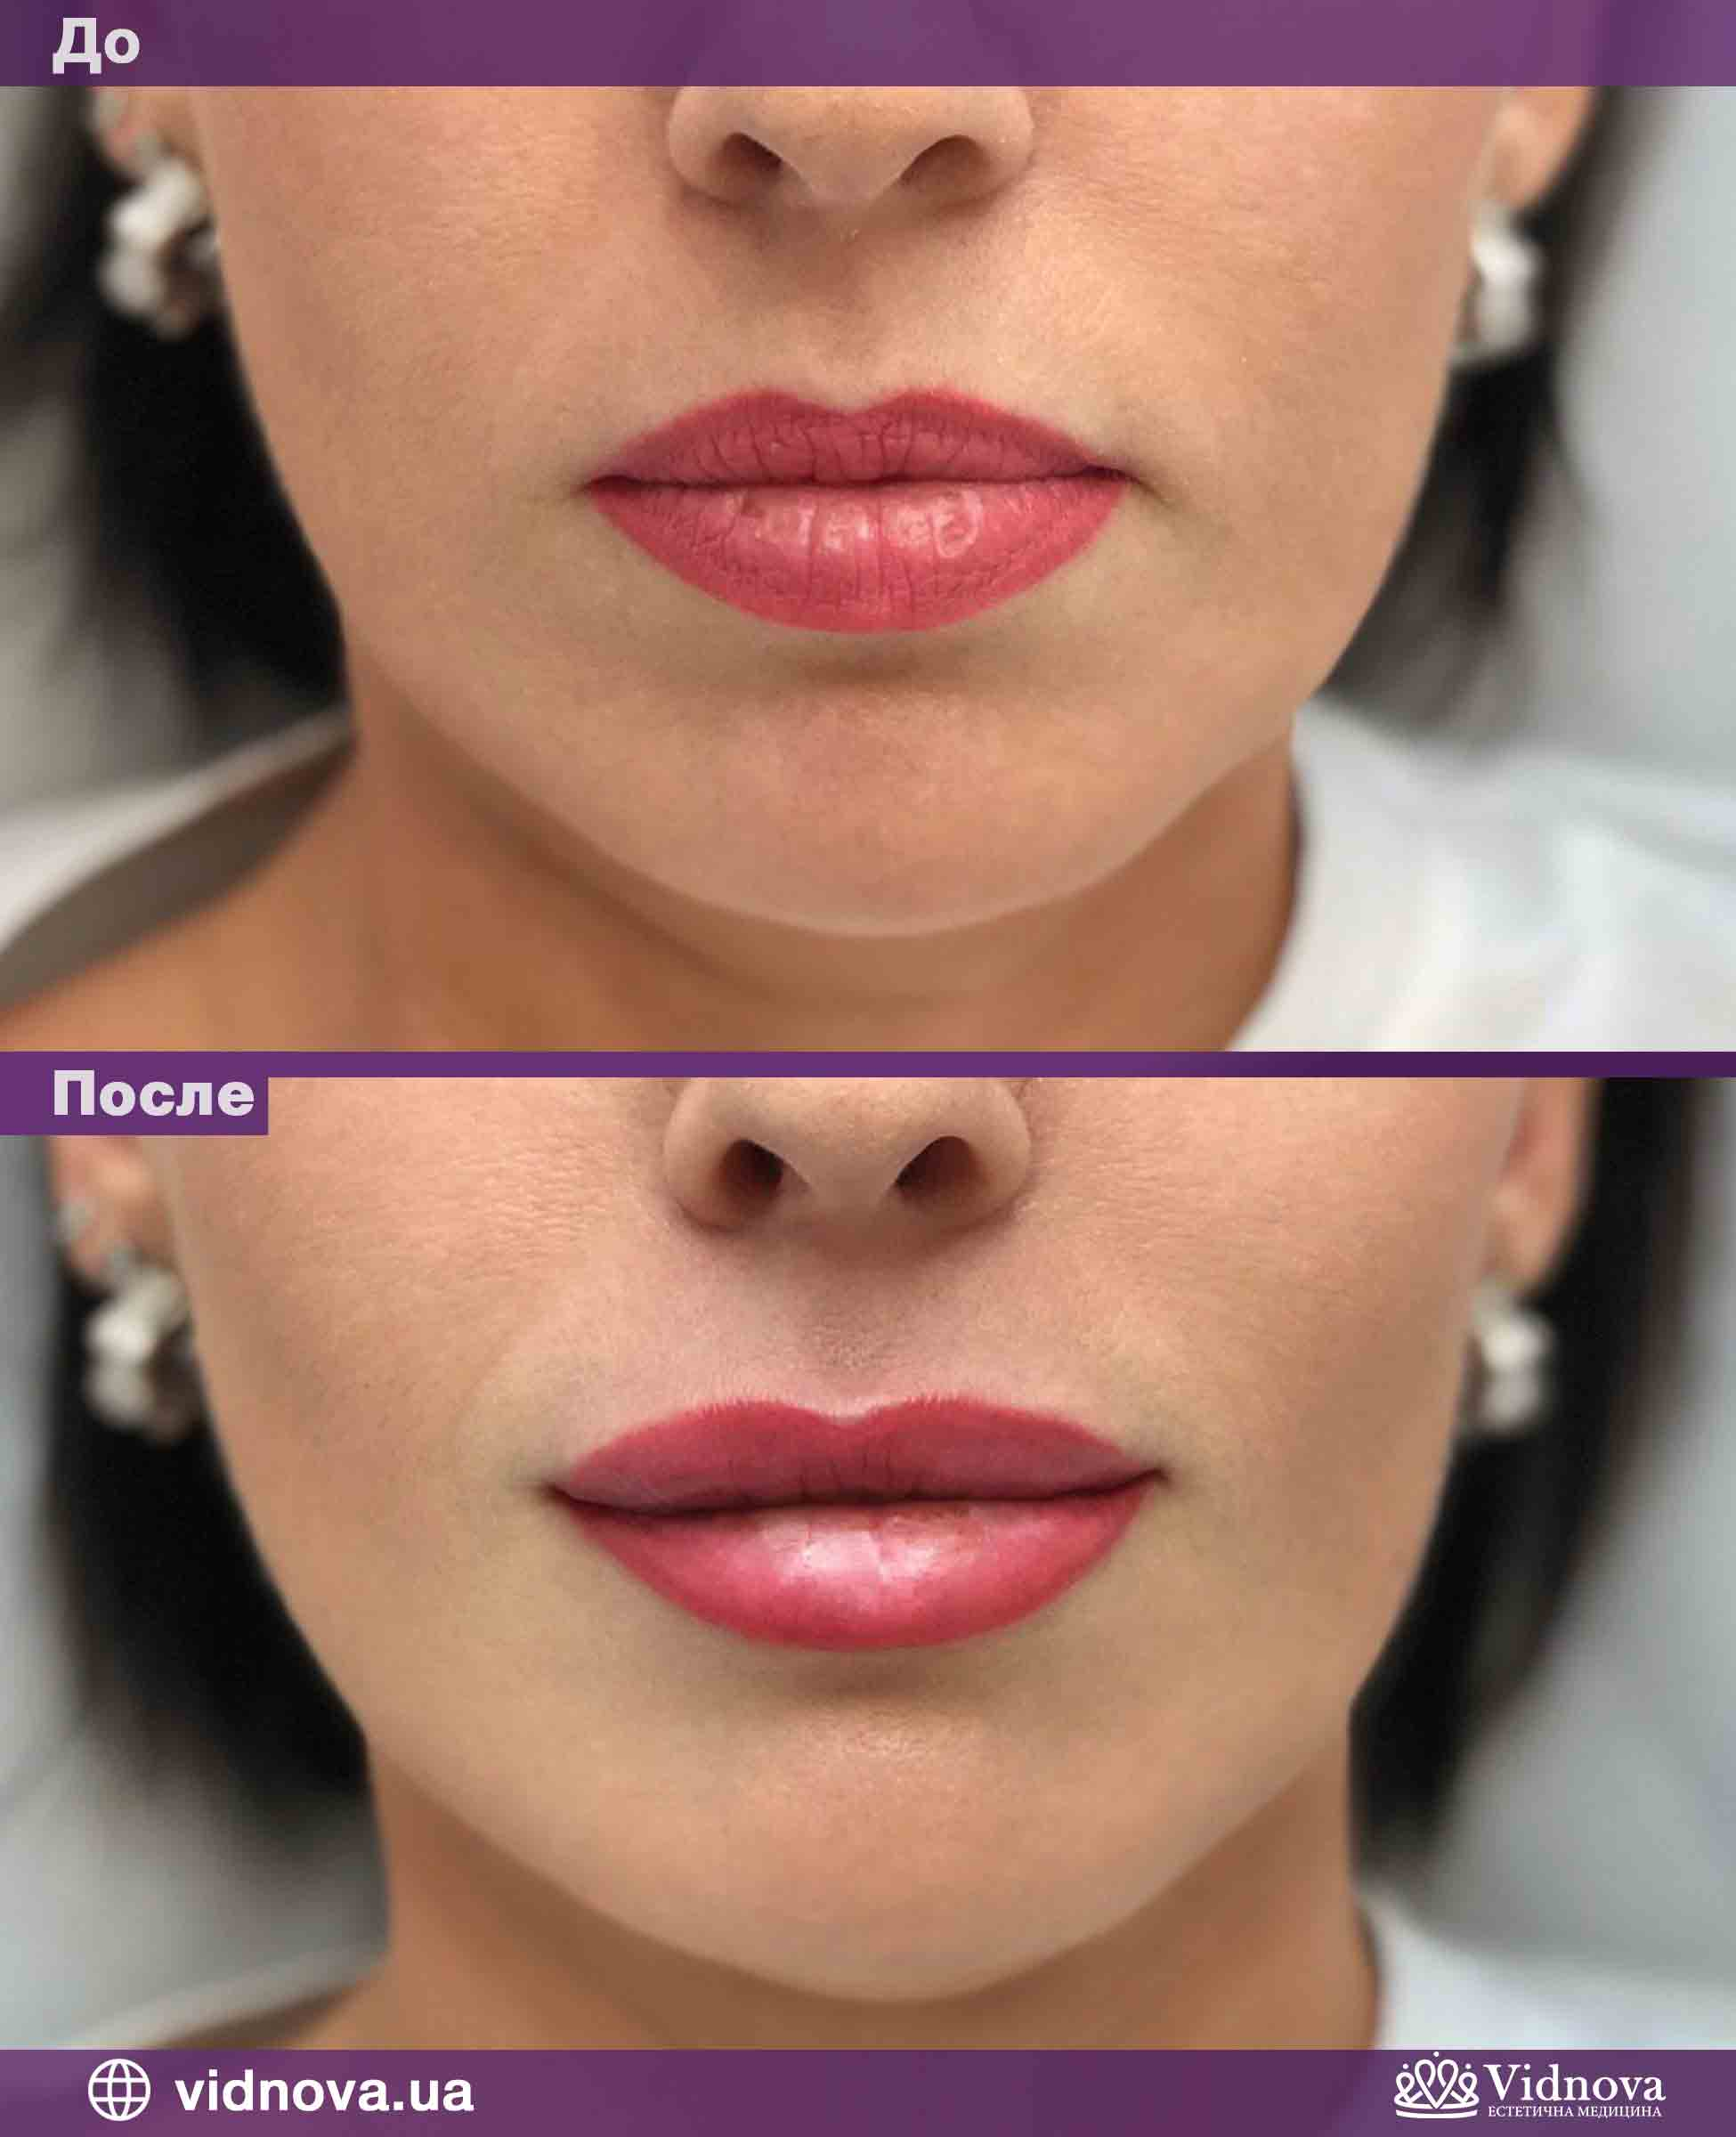 Увеличение губ: Фото До и После - Пример №3-1 - Клиника Vidnova